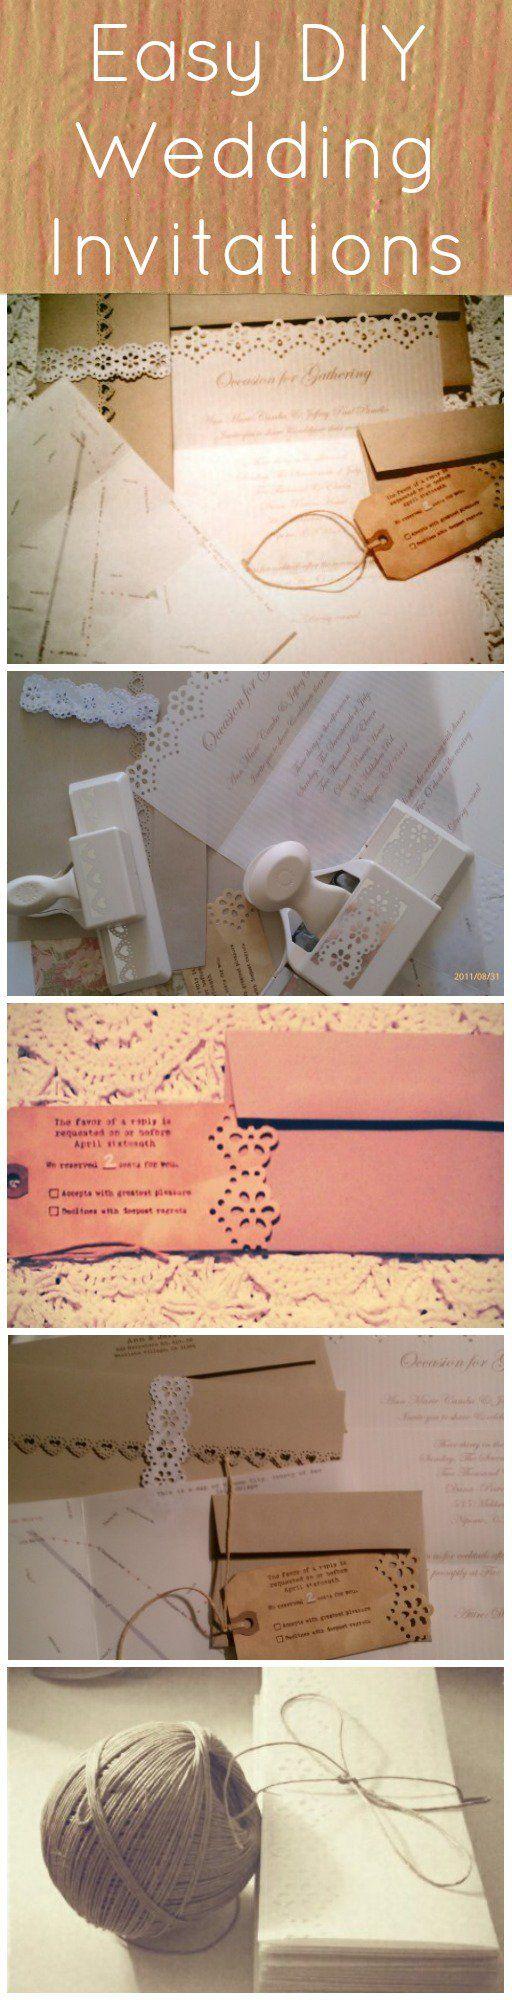 Diy vintage inspired wedding invitations diy wedding invitations